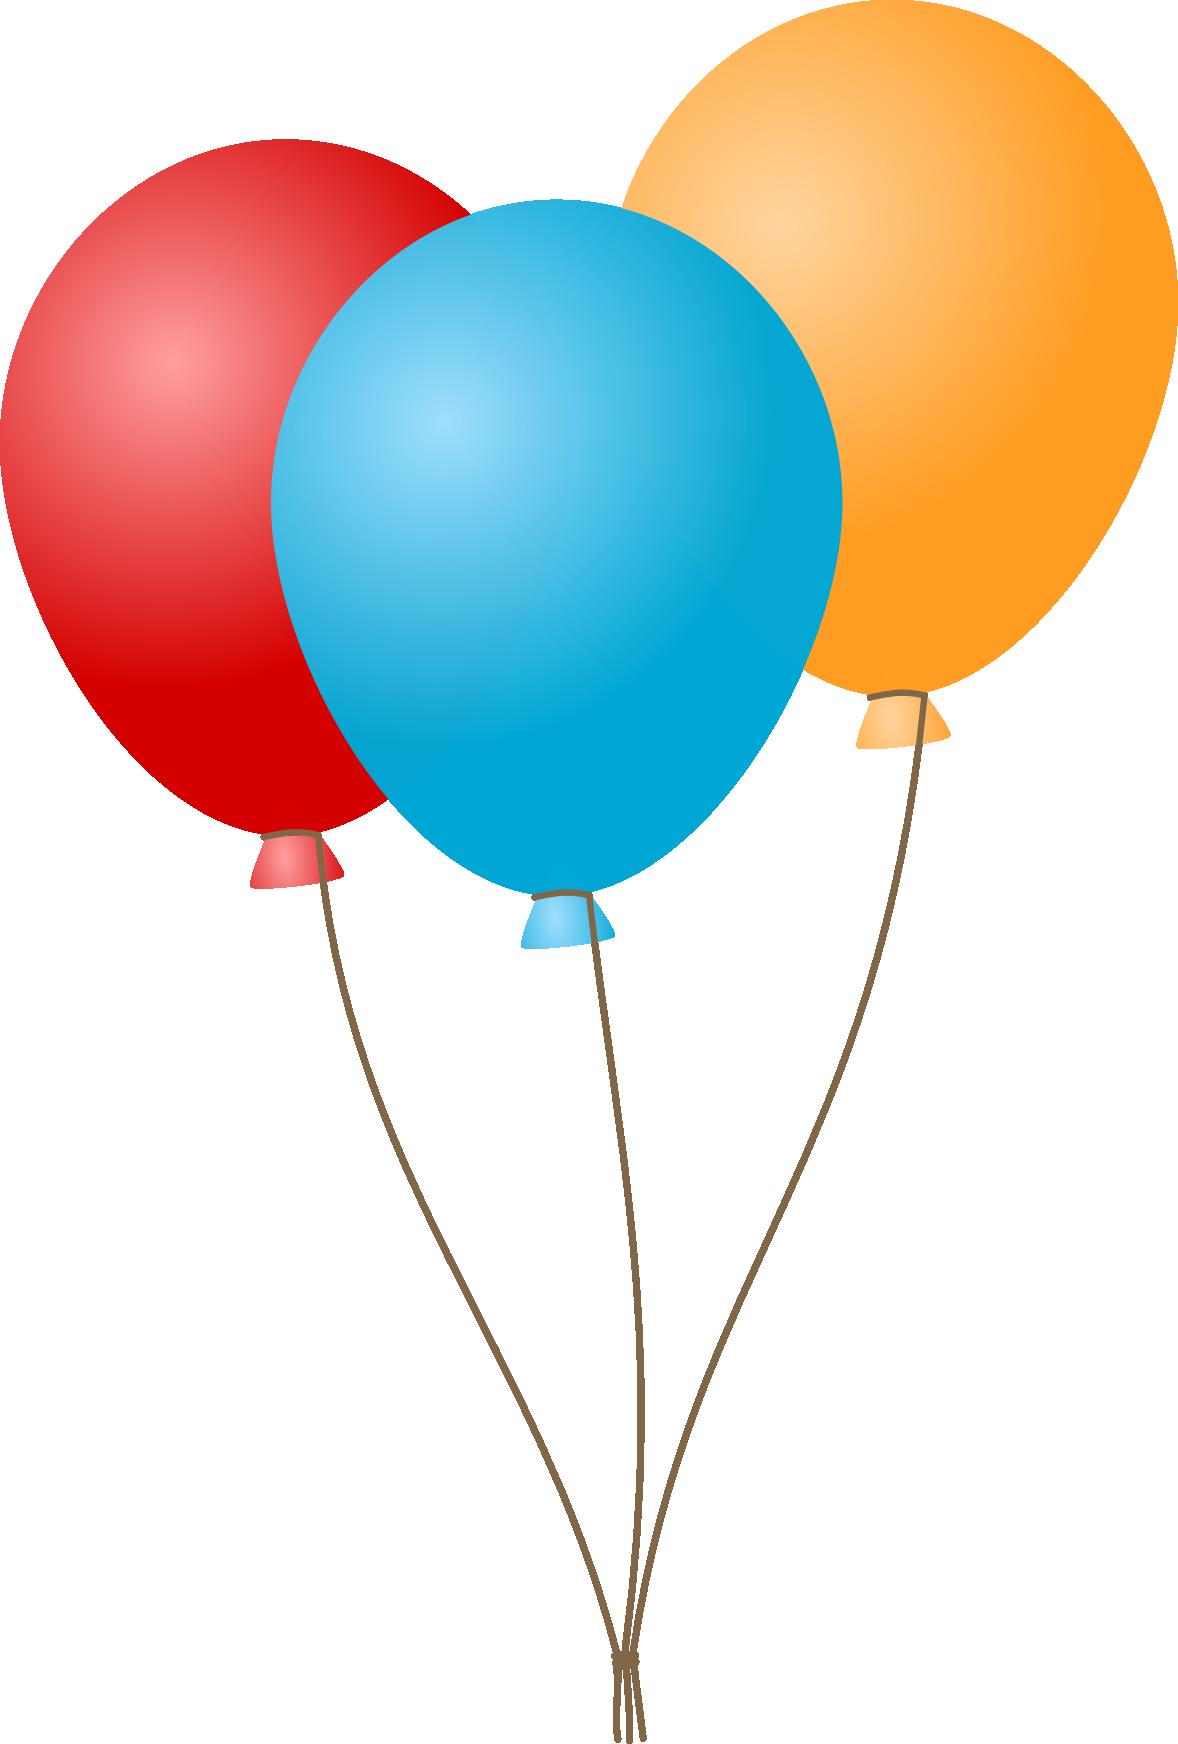 balloon PNG image - Ballons PNG